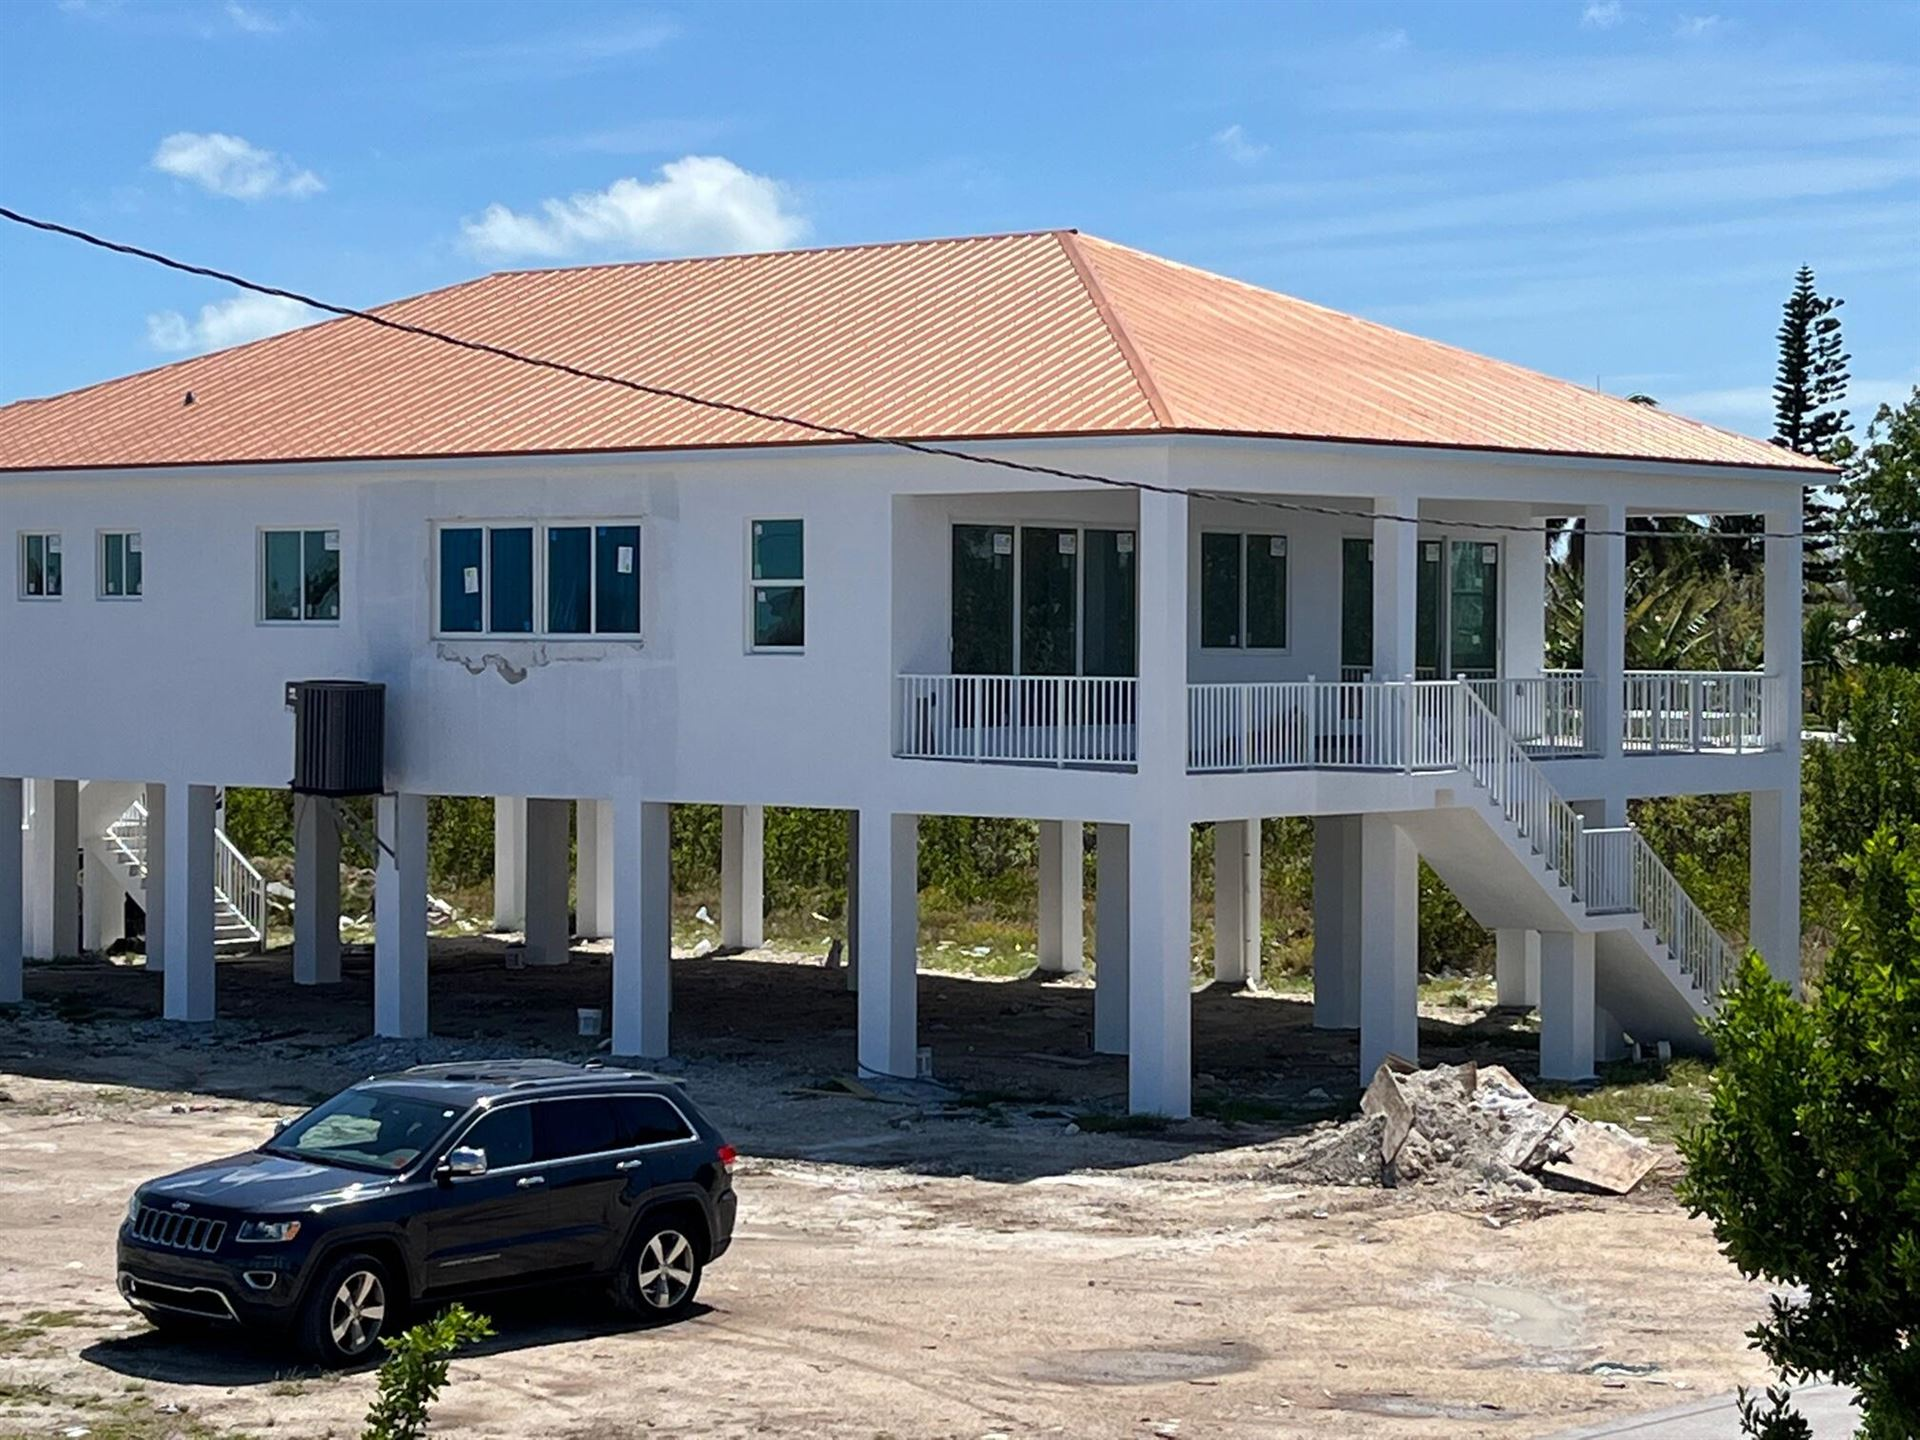 30980 Witters Lane, Big Pine, FL 33043 - #: 595652